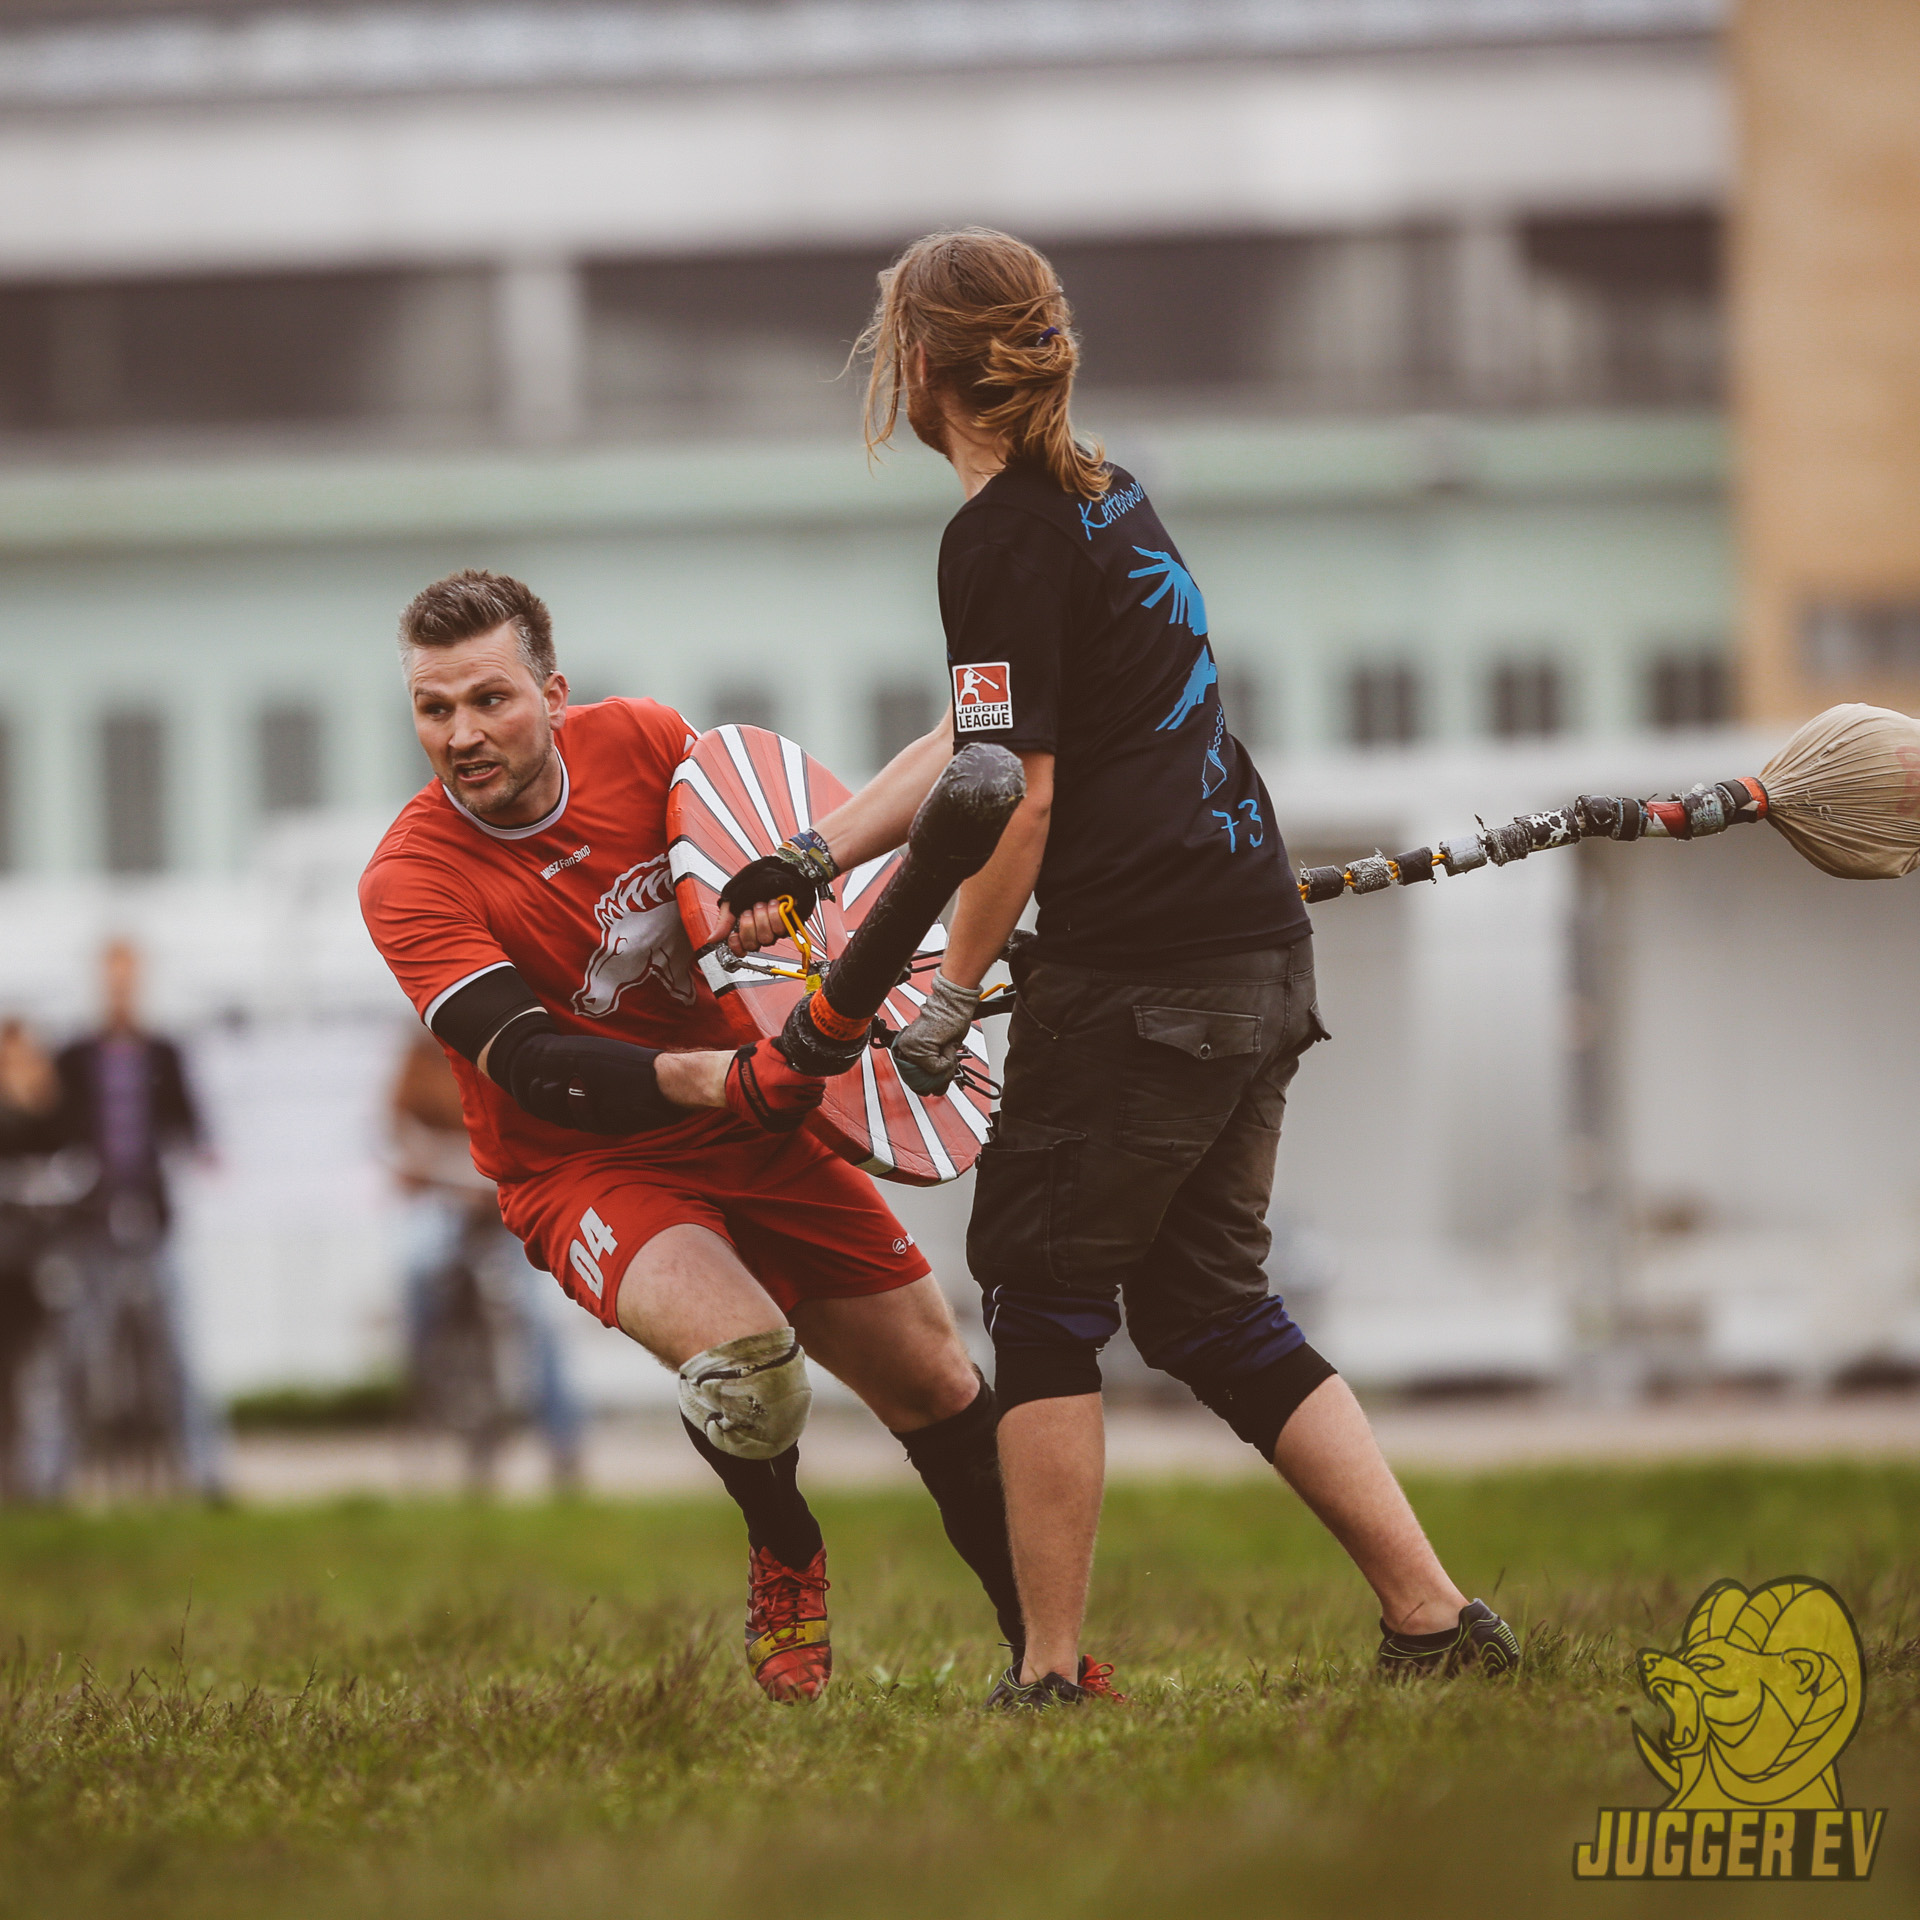 Berliner_Jugger_Pokal_2017-214